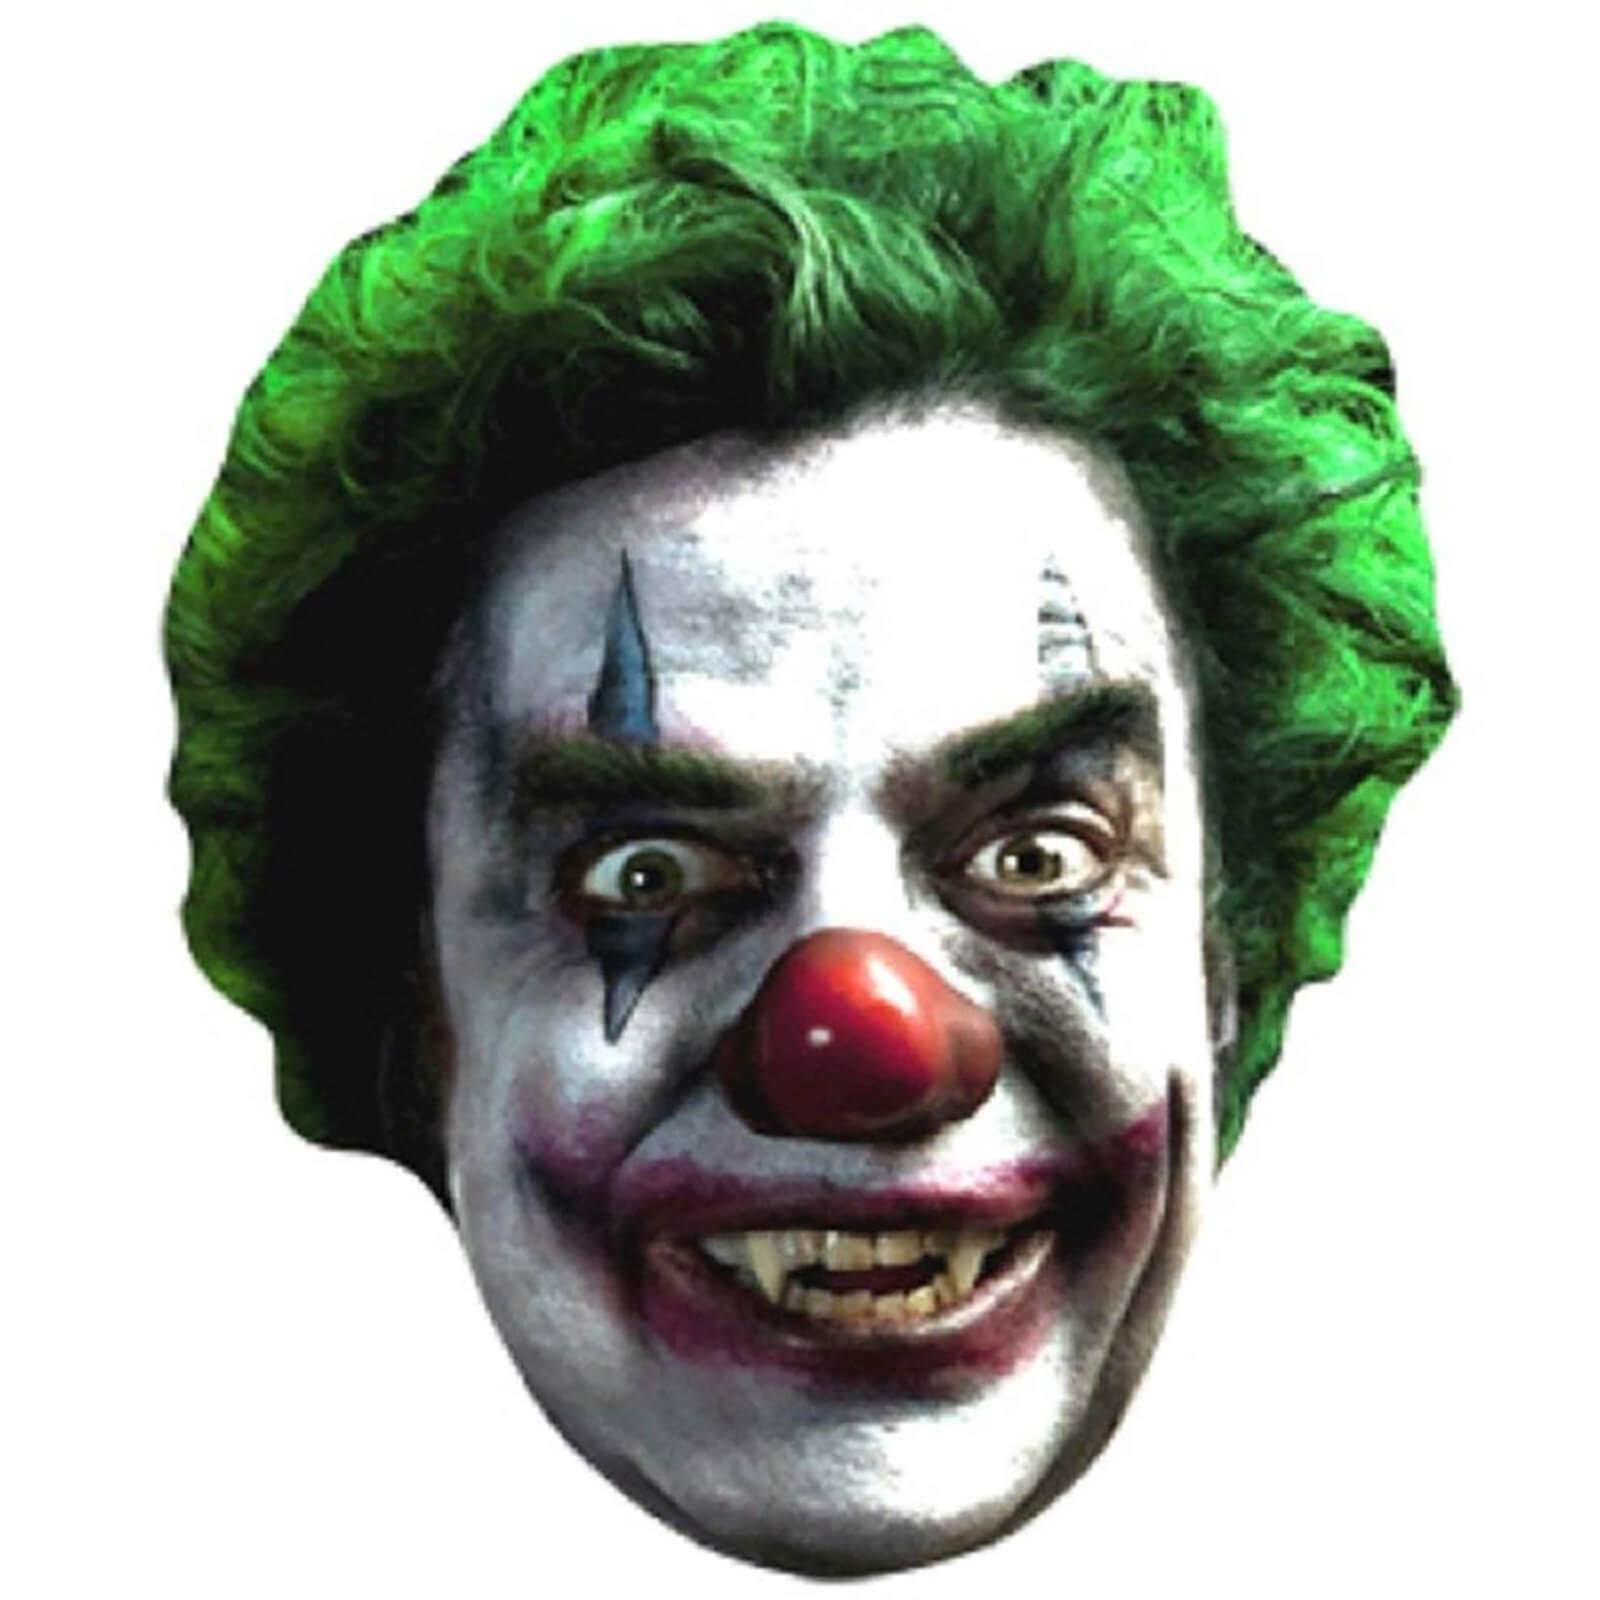 Clown Face Masks (Multi-Pack)